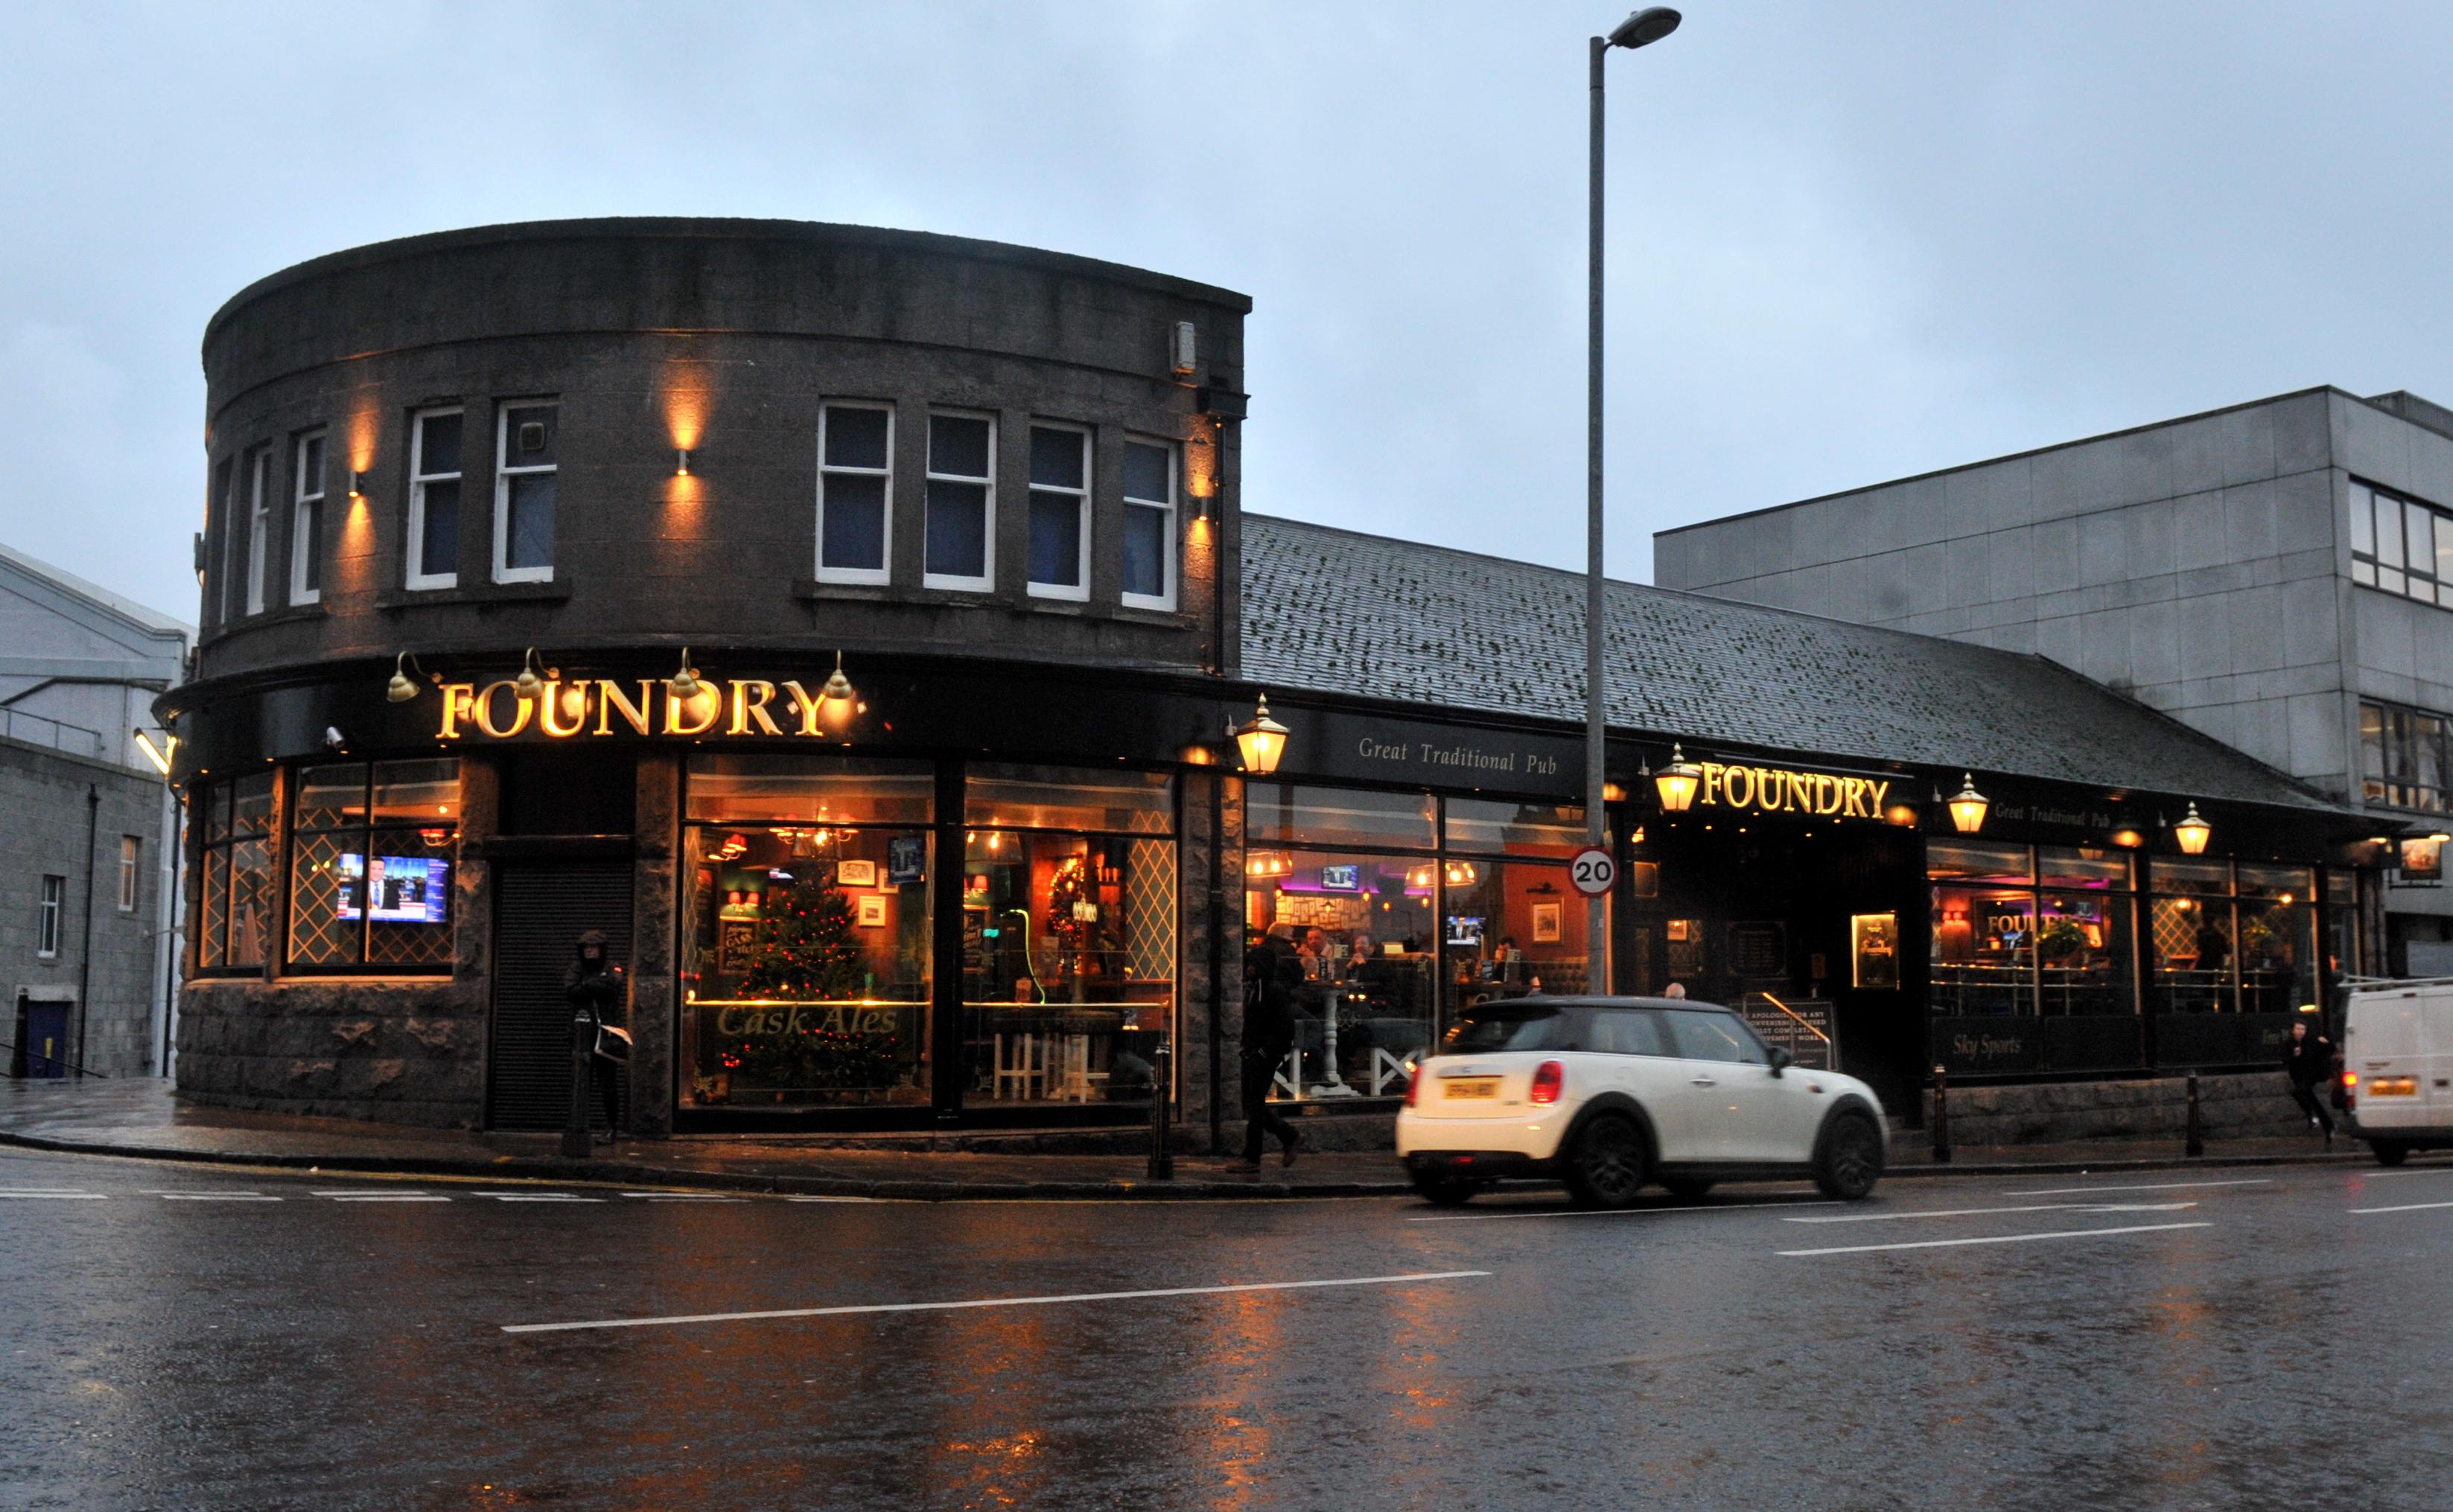 The Foundry on Holburn Street.